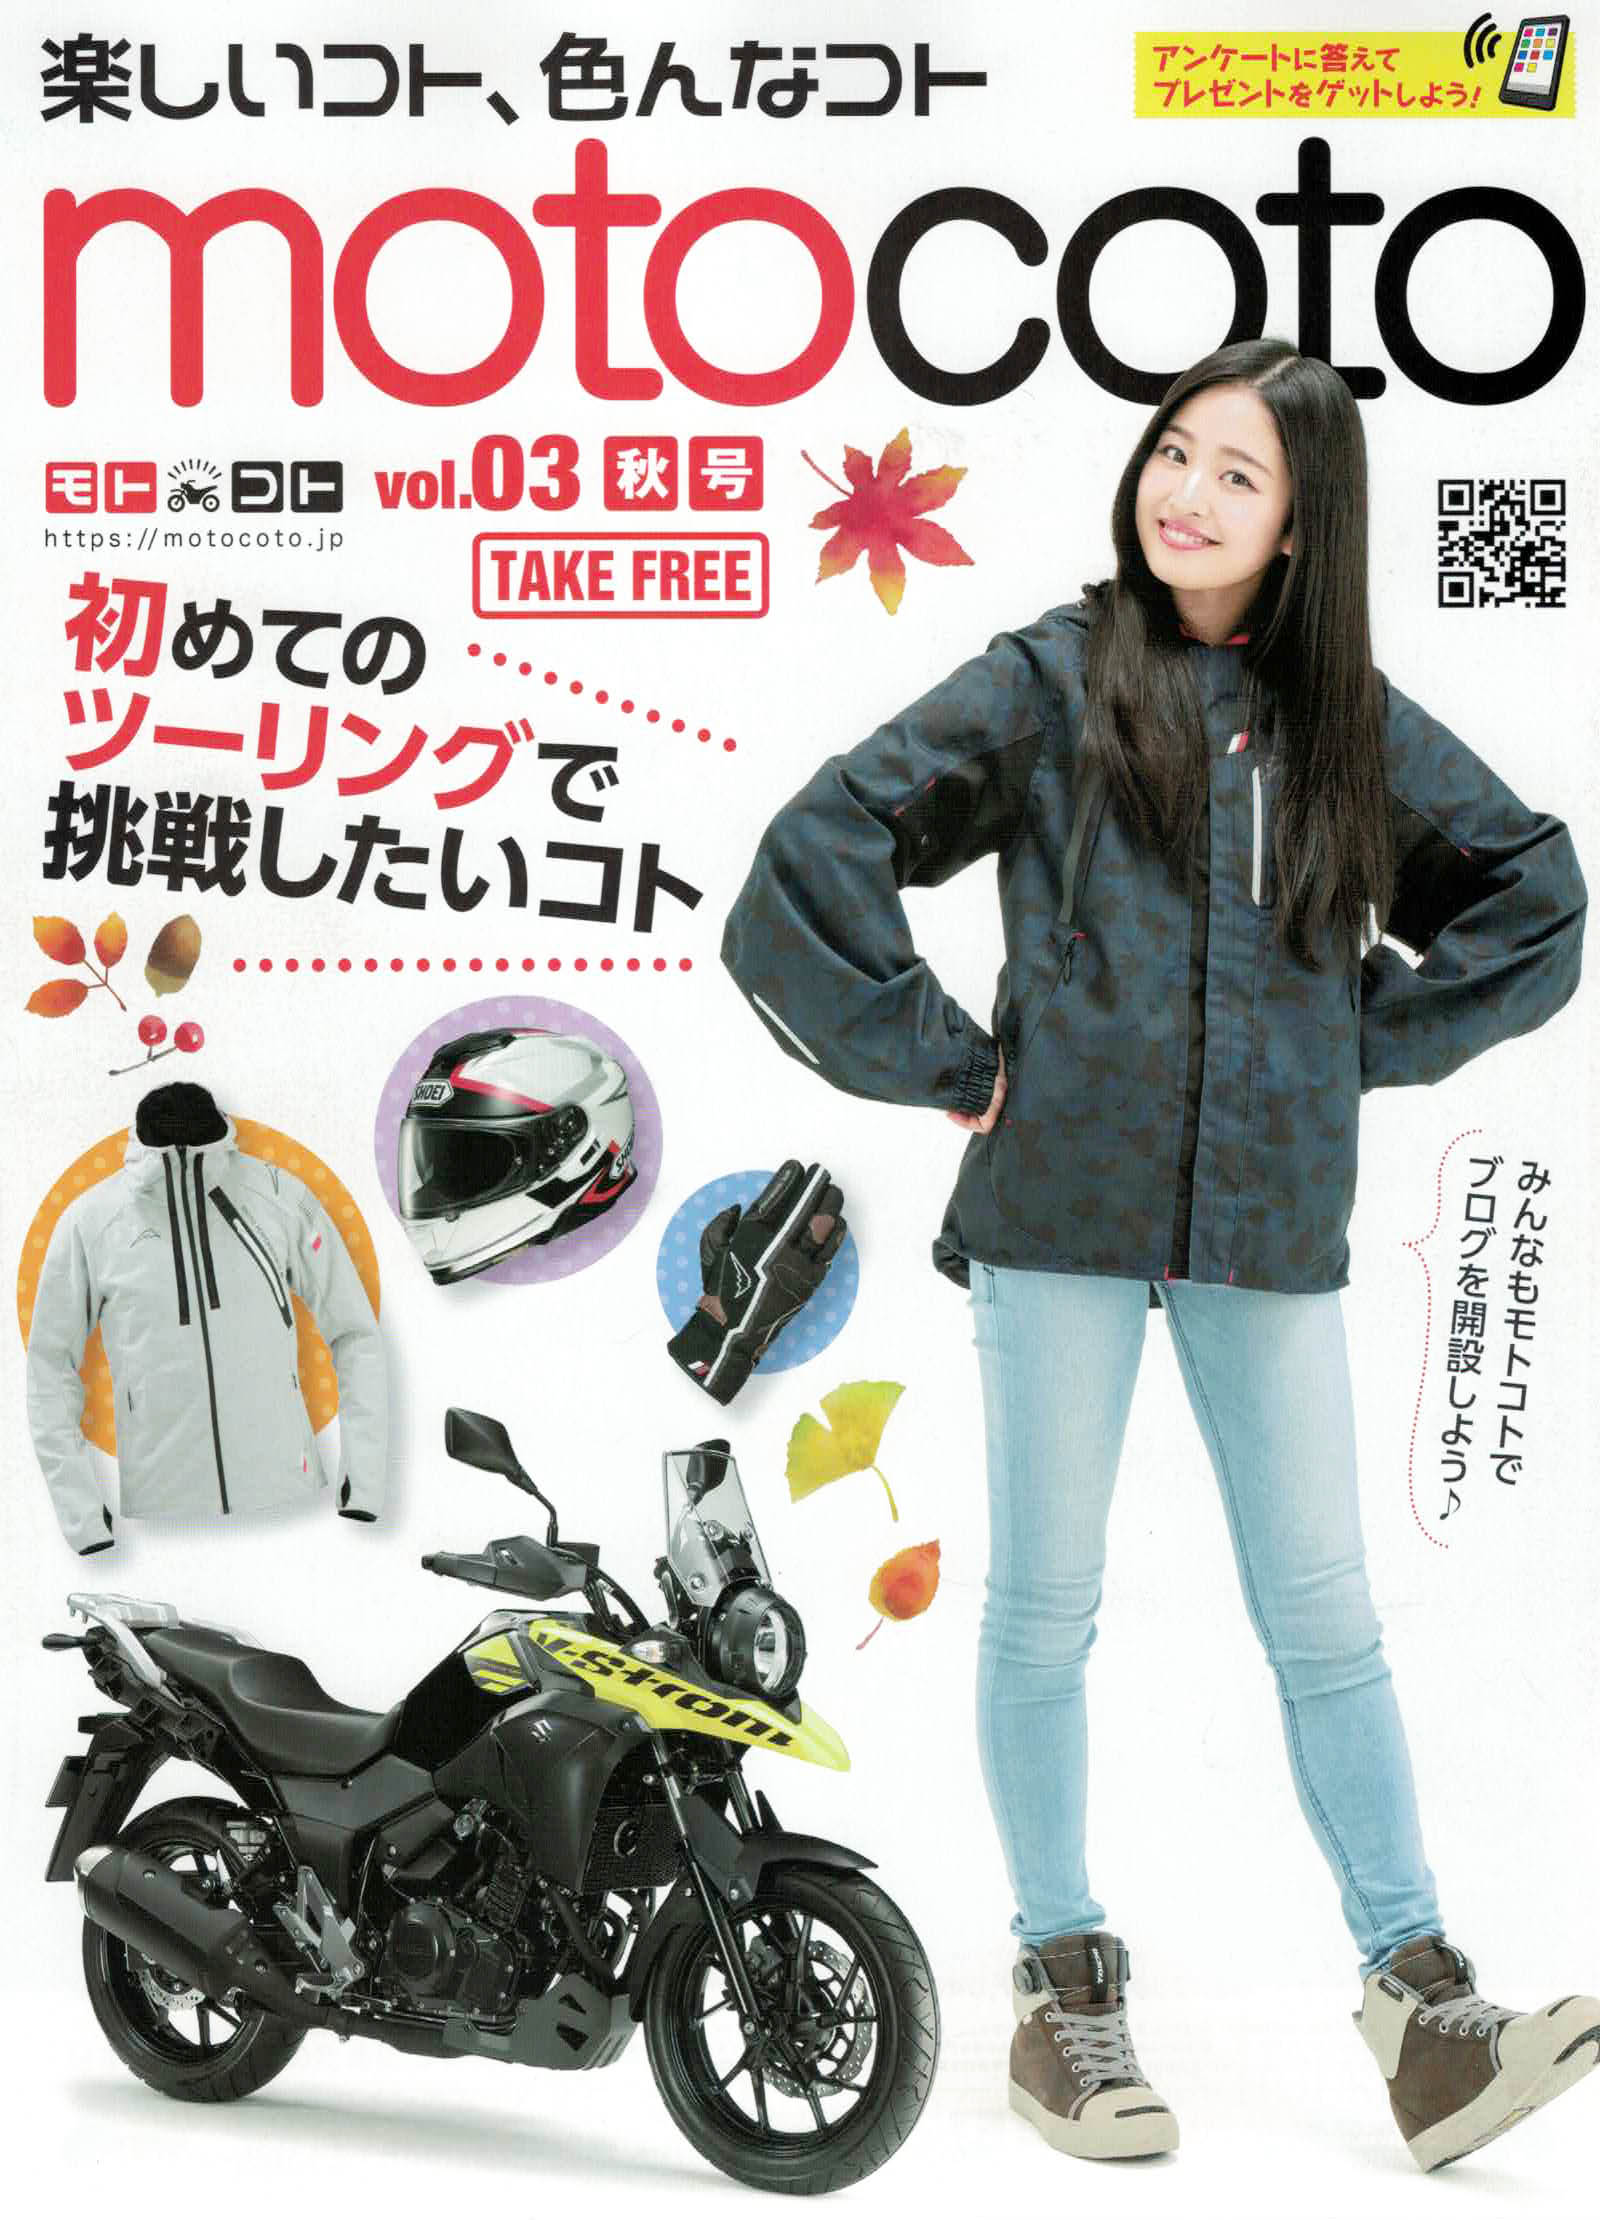 【motocoto Vol.3掲載】FANTIC CABALLERO SCRAMBLER250、Enduro250